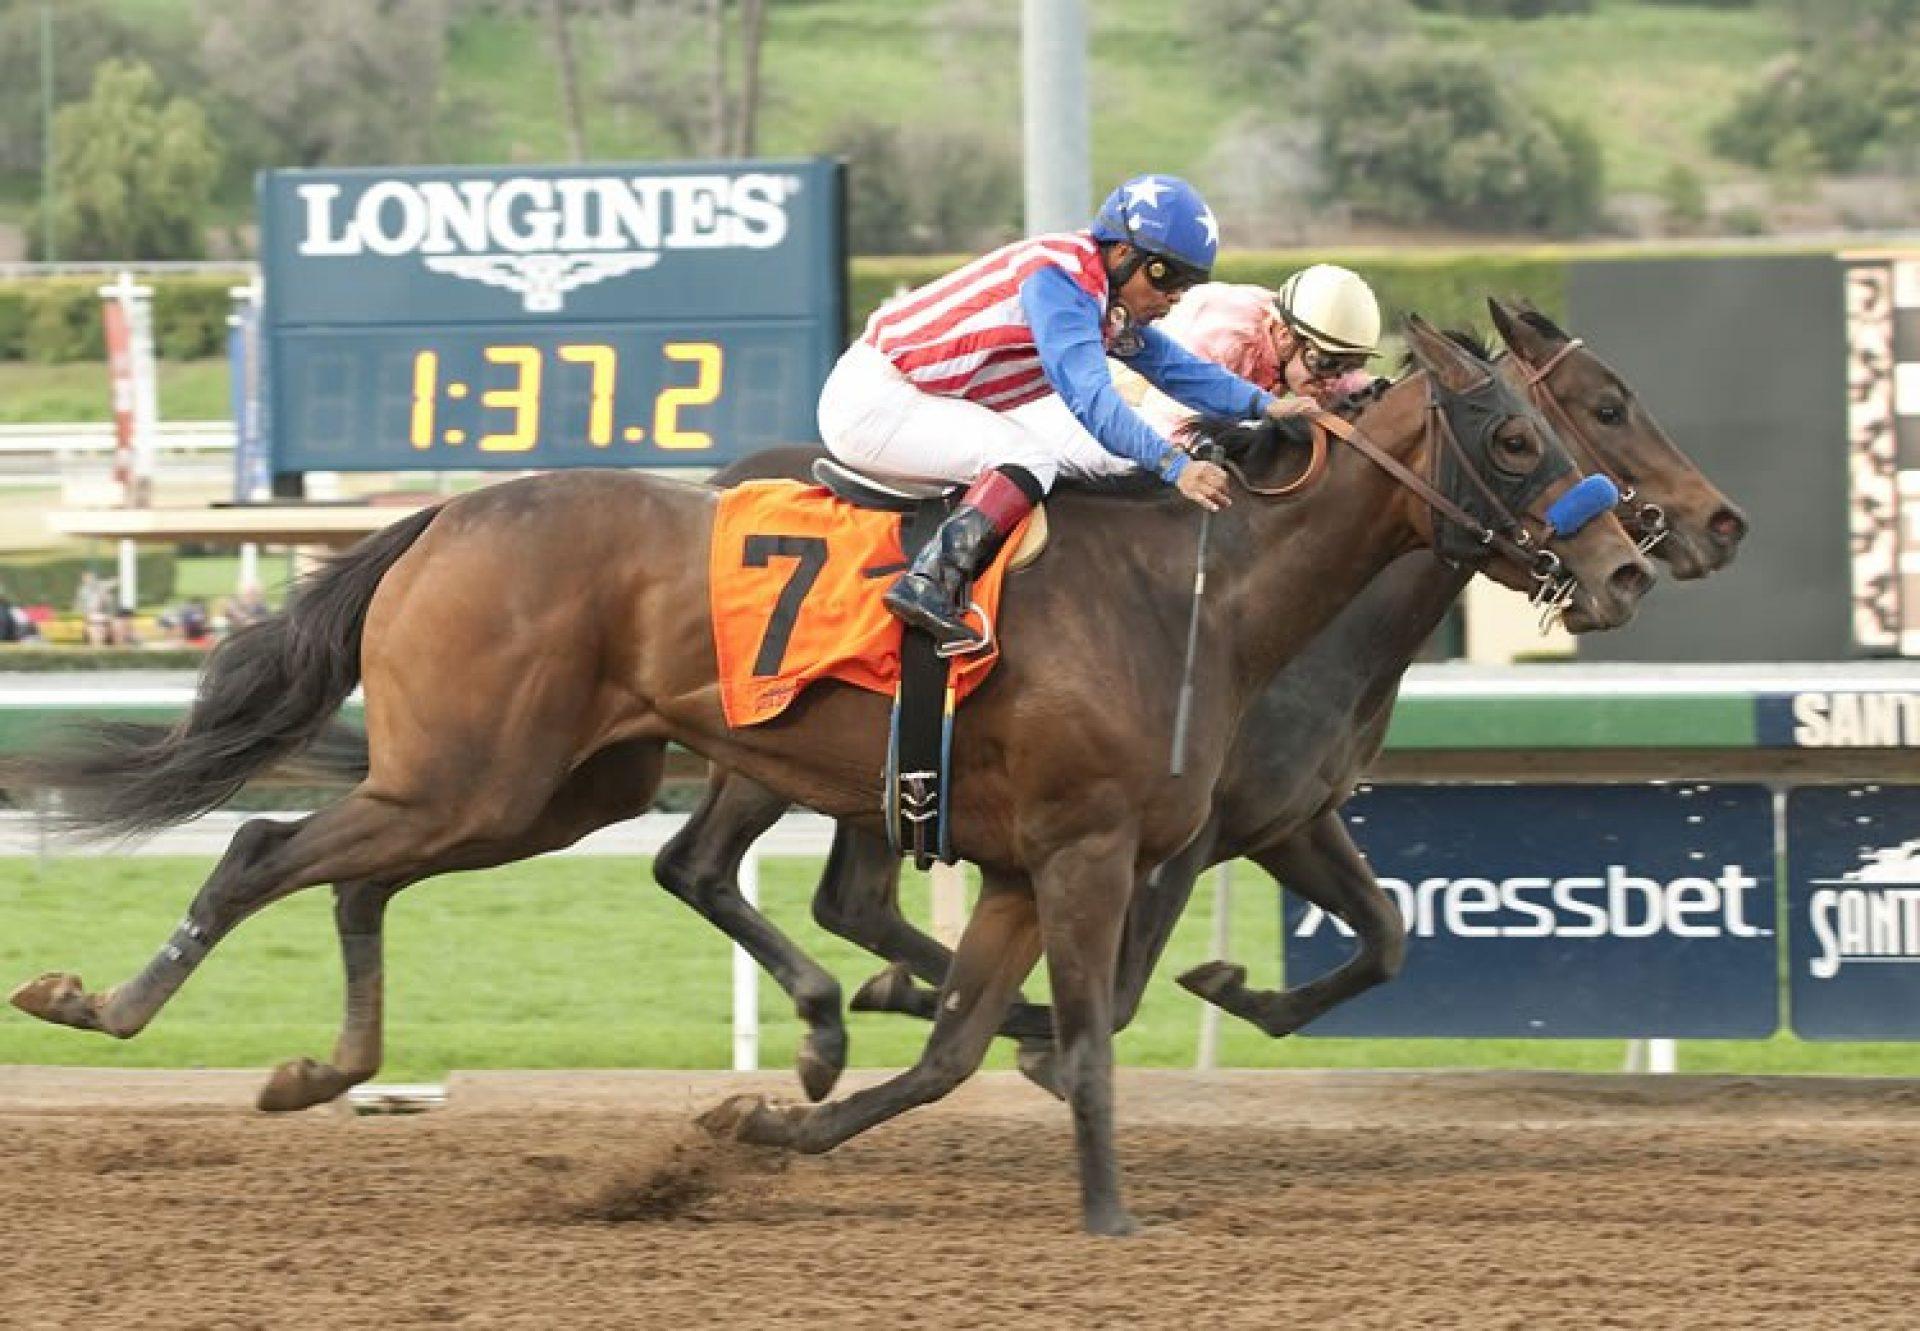 Luminance (Tale Of The Cat) winning an allowance race at Santa Anita